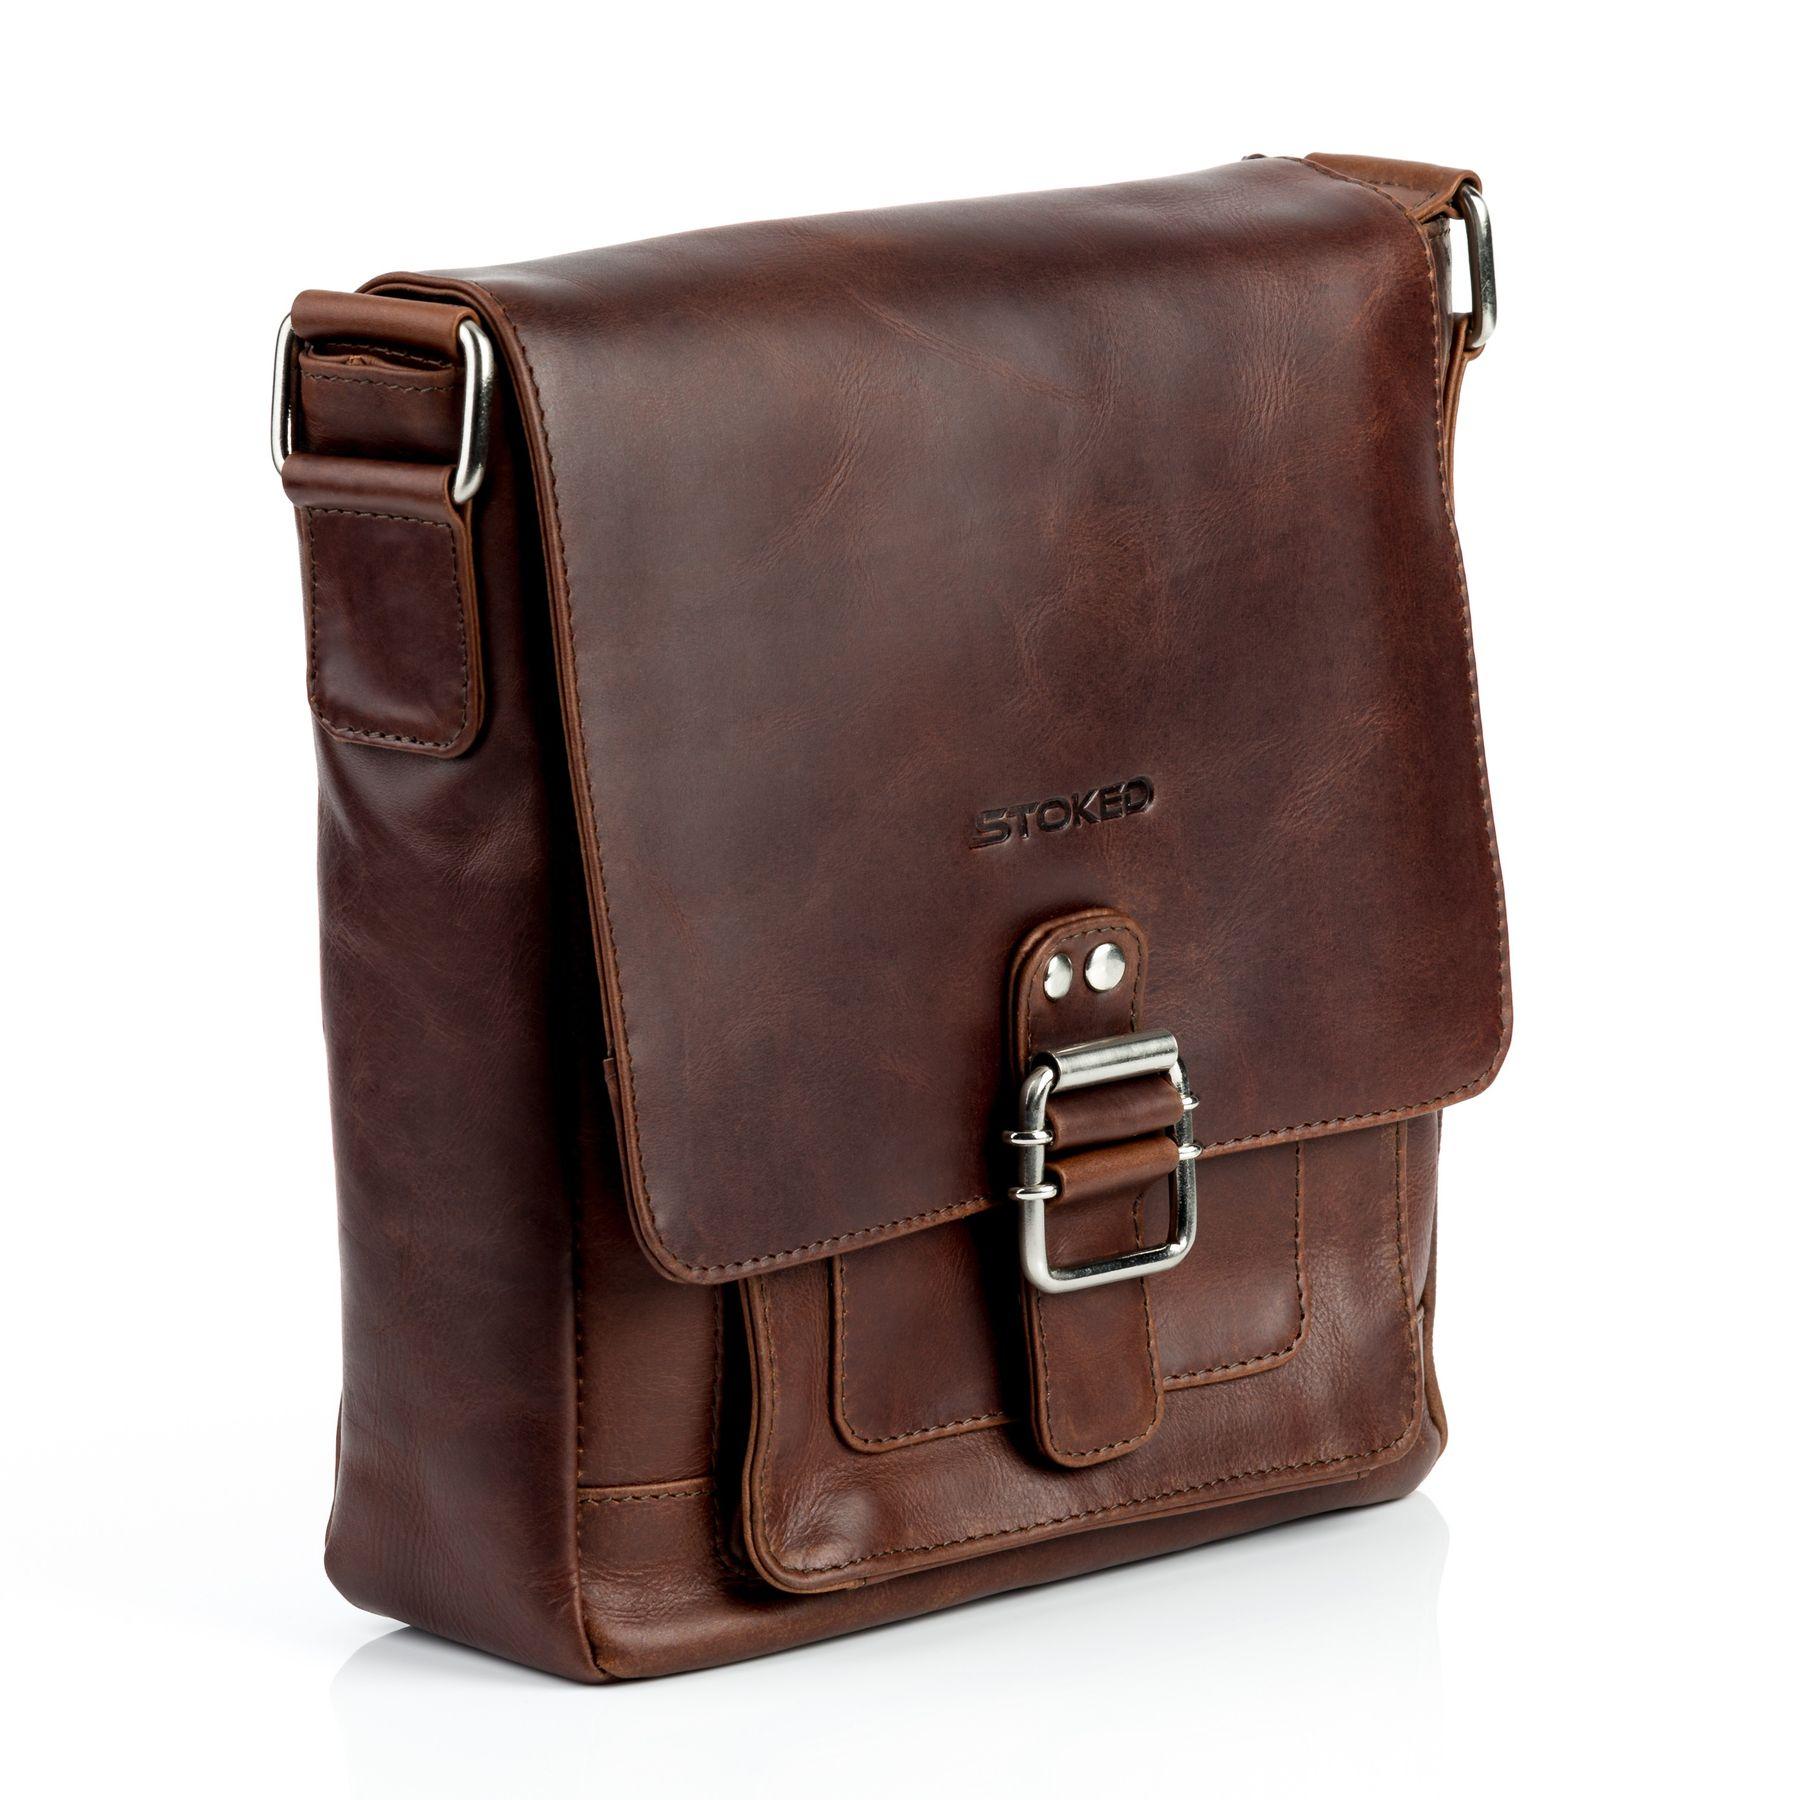 38bac3a812425e STOKED Umhängetasche Natur-Leder NATHAN braun-cognac Messenger Bag ...